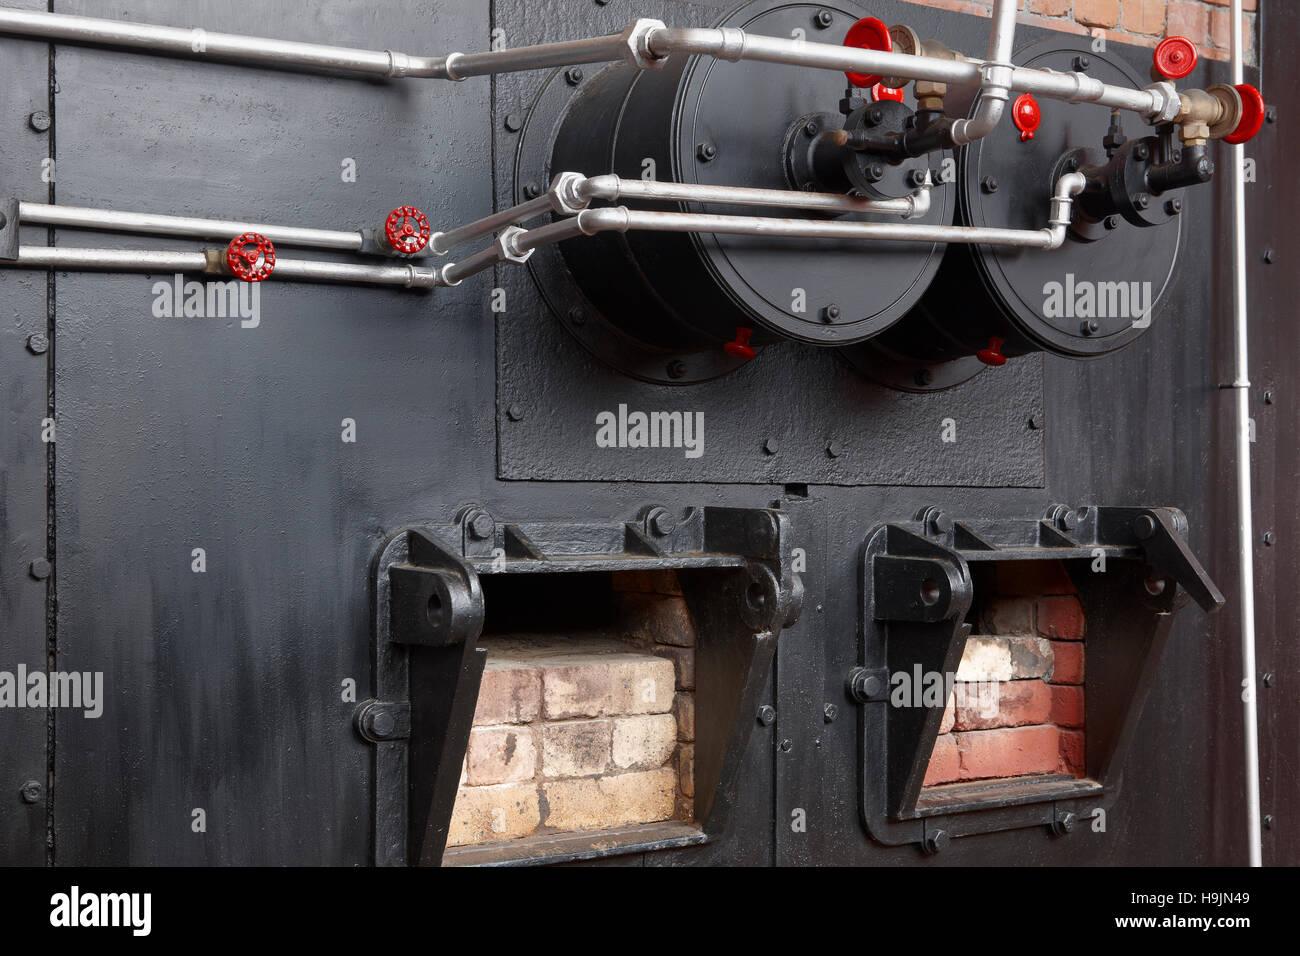 Old Gas Boiler Stockfotos & Old Gas Boiler Bilder - Alamy